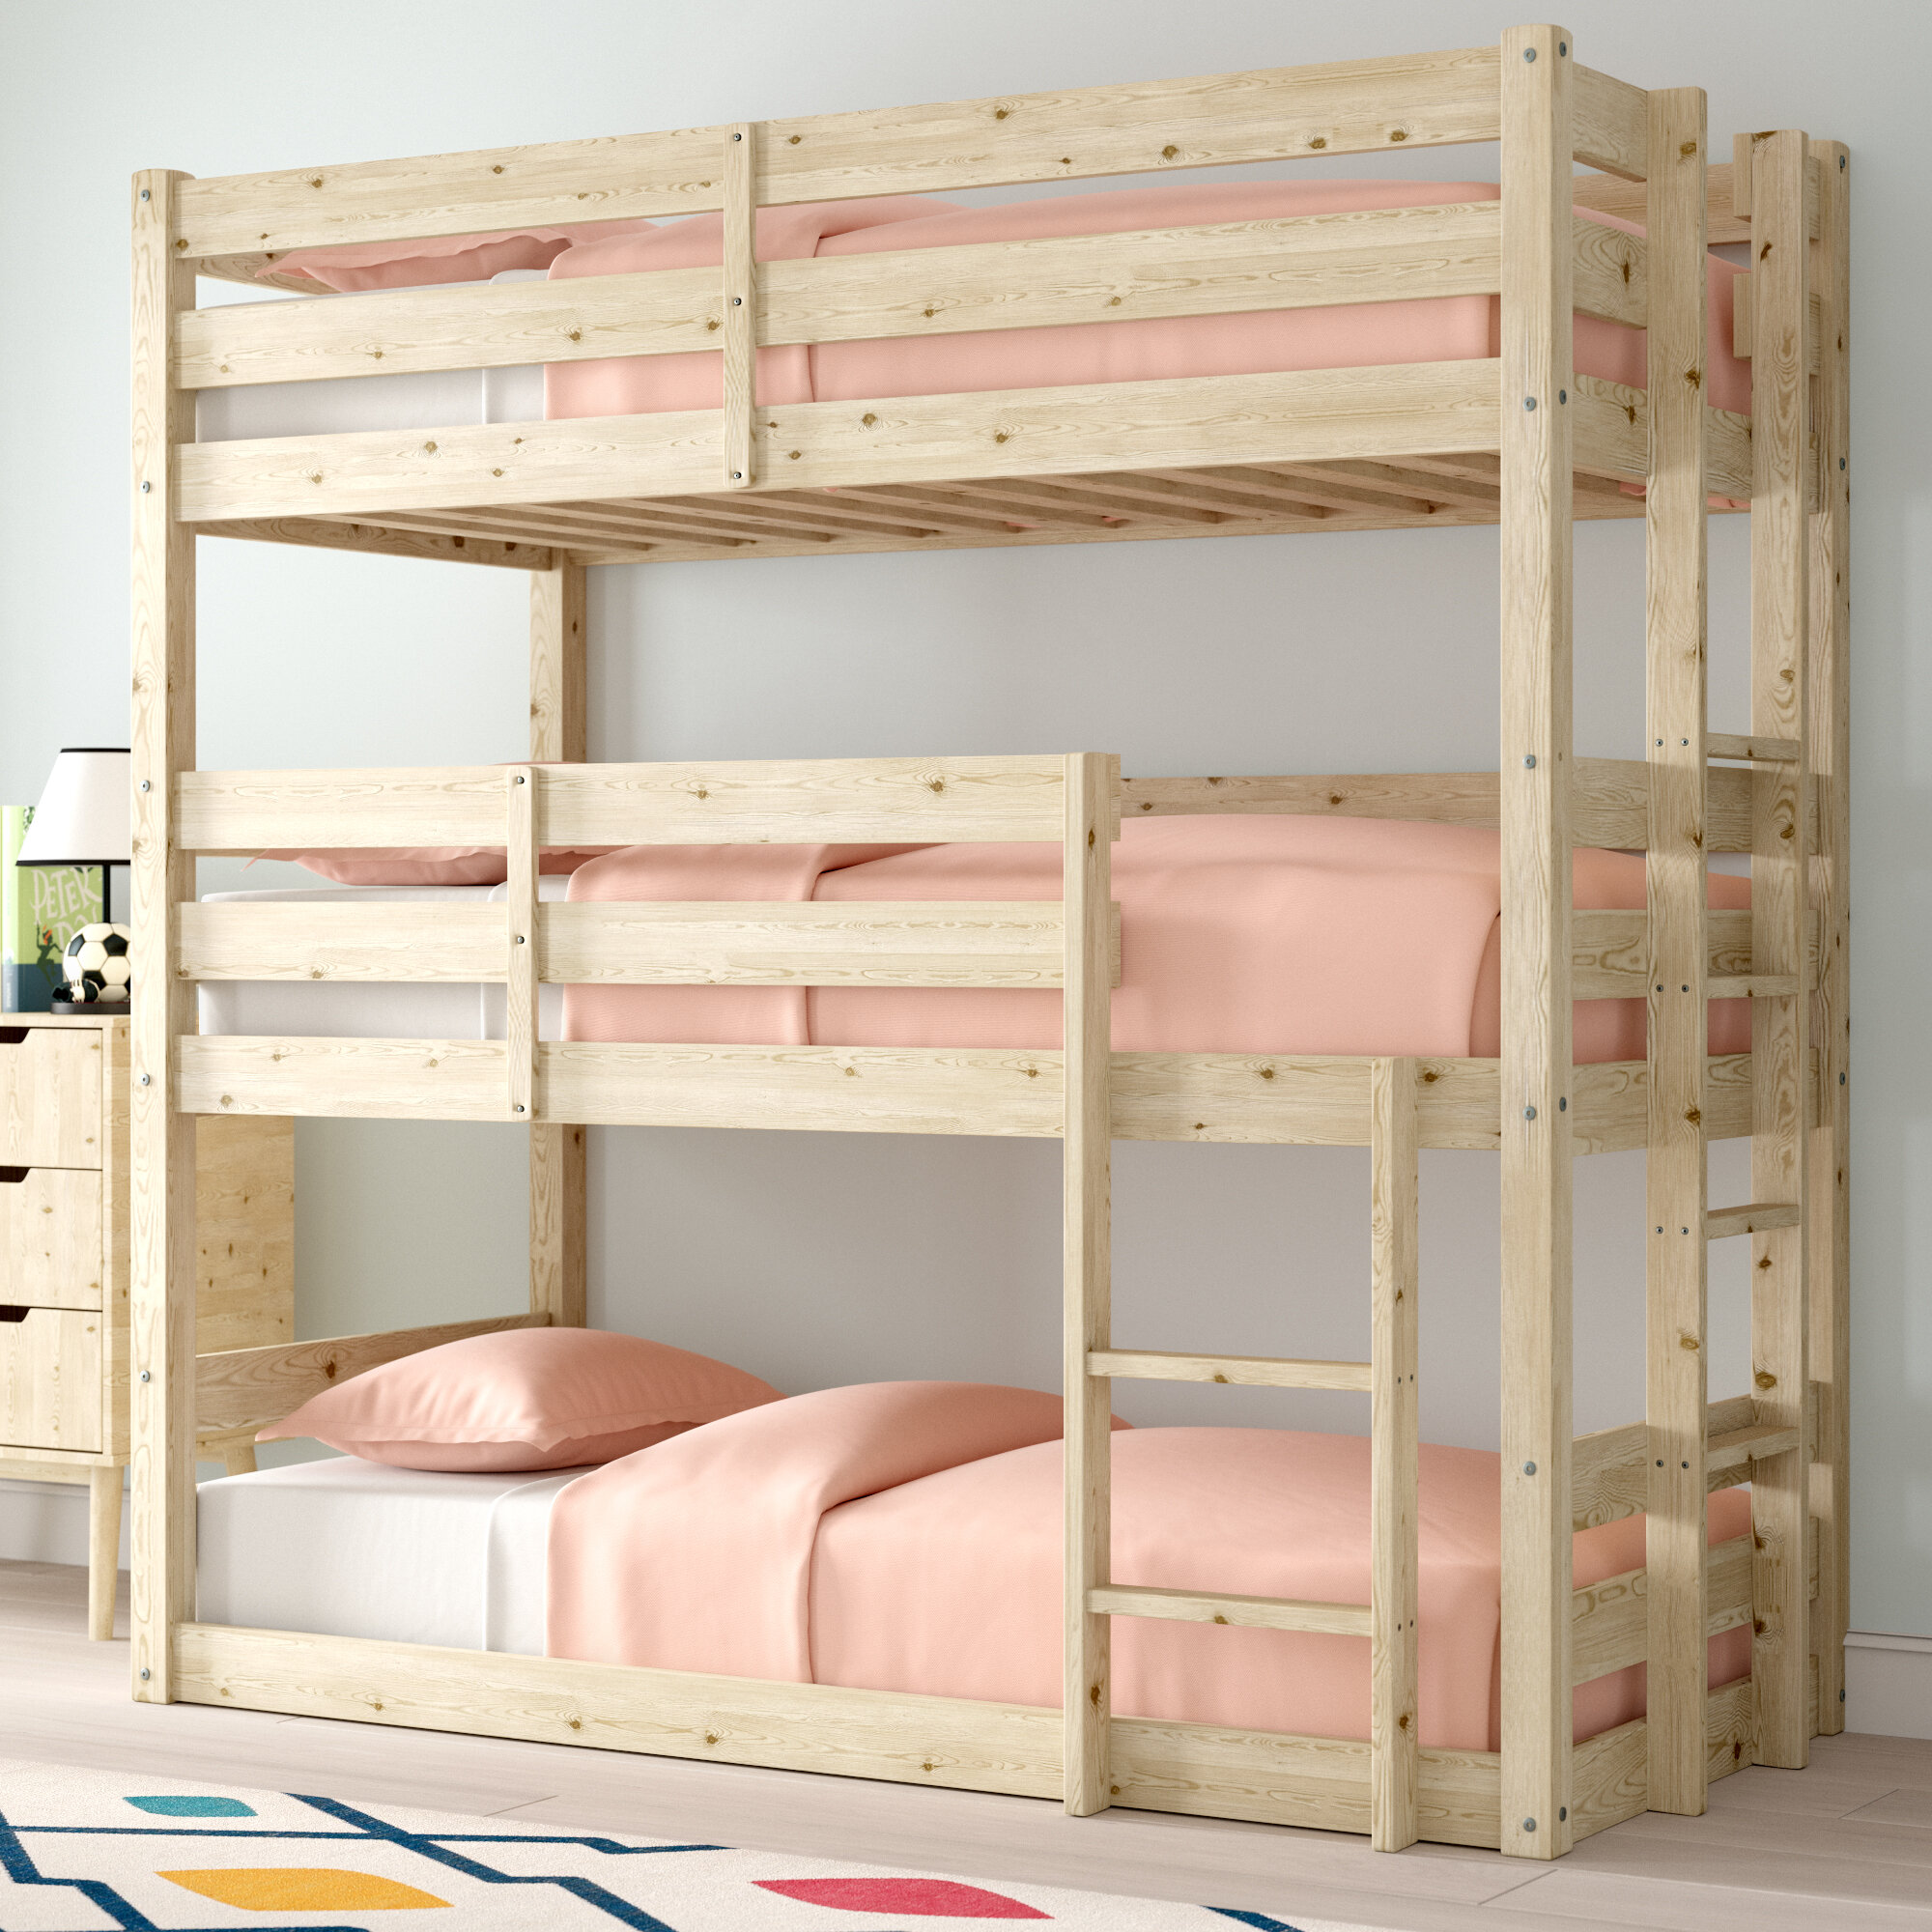 Triple Sleeper Bunk Beds You Ll Love Wayfair Co Uk